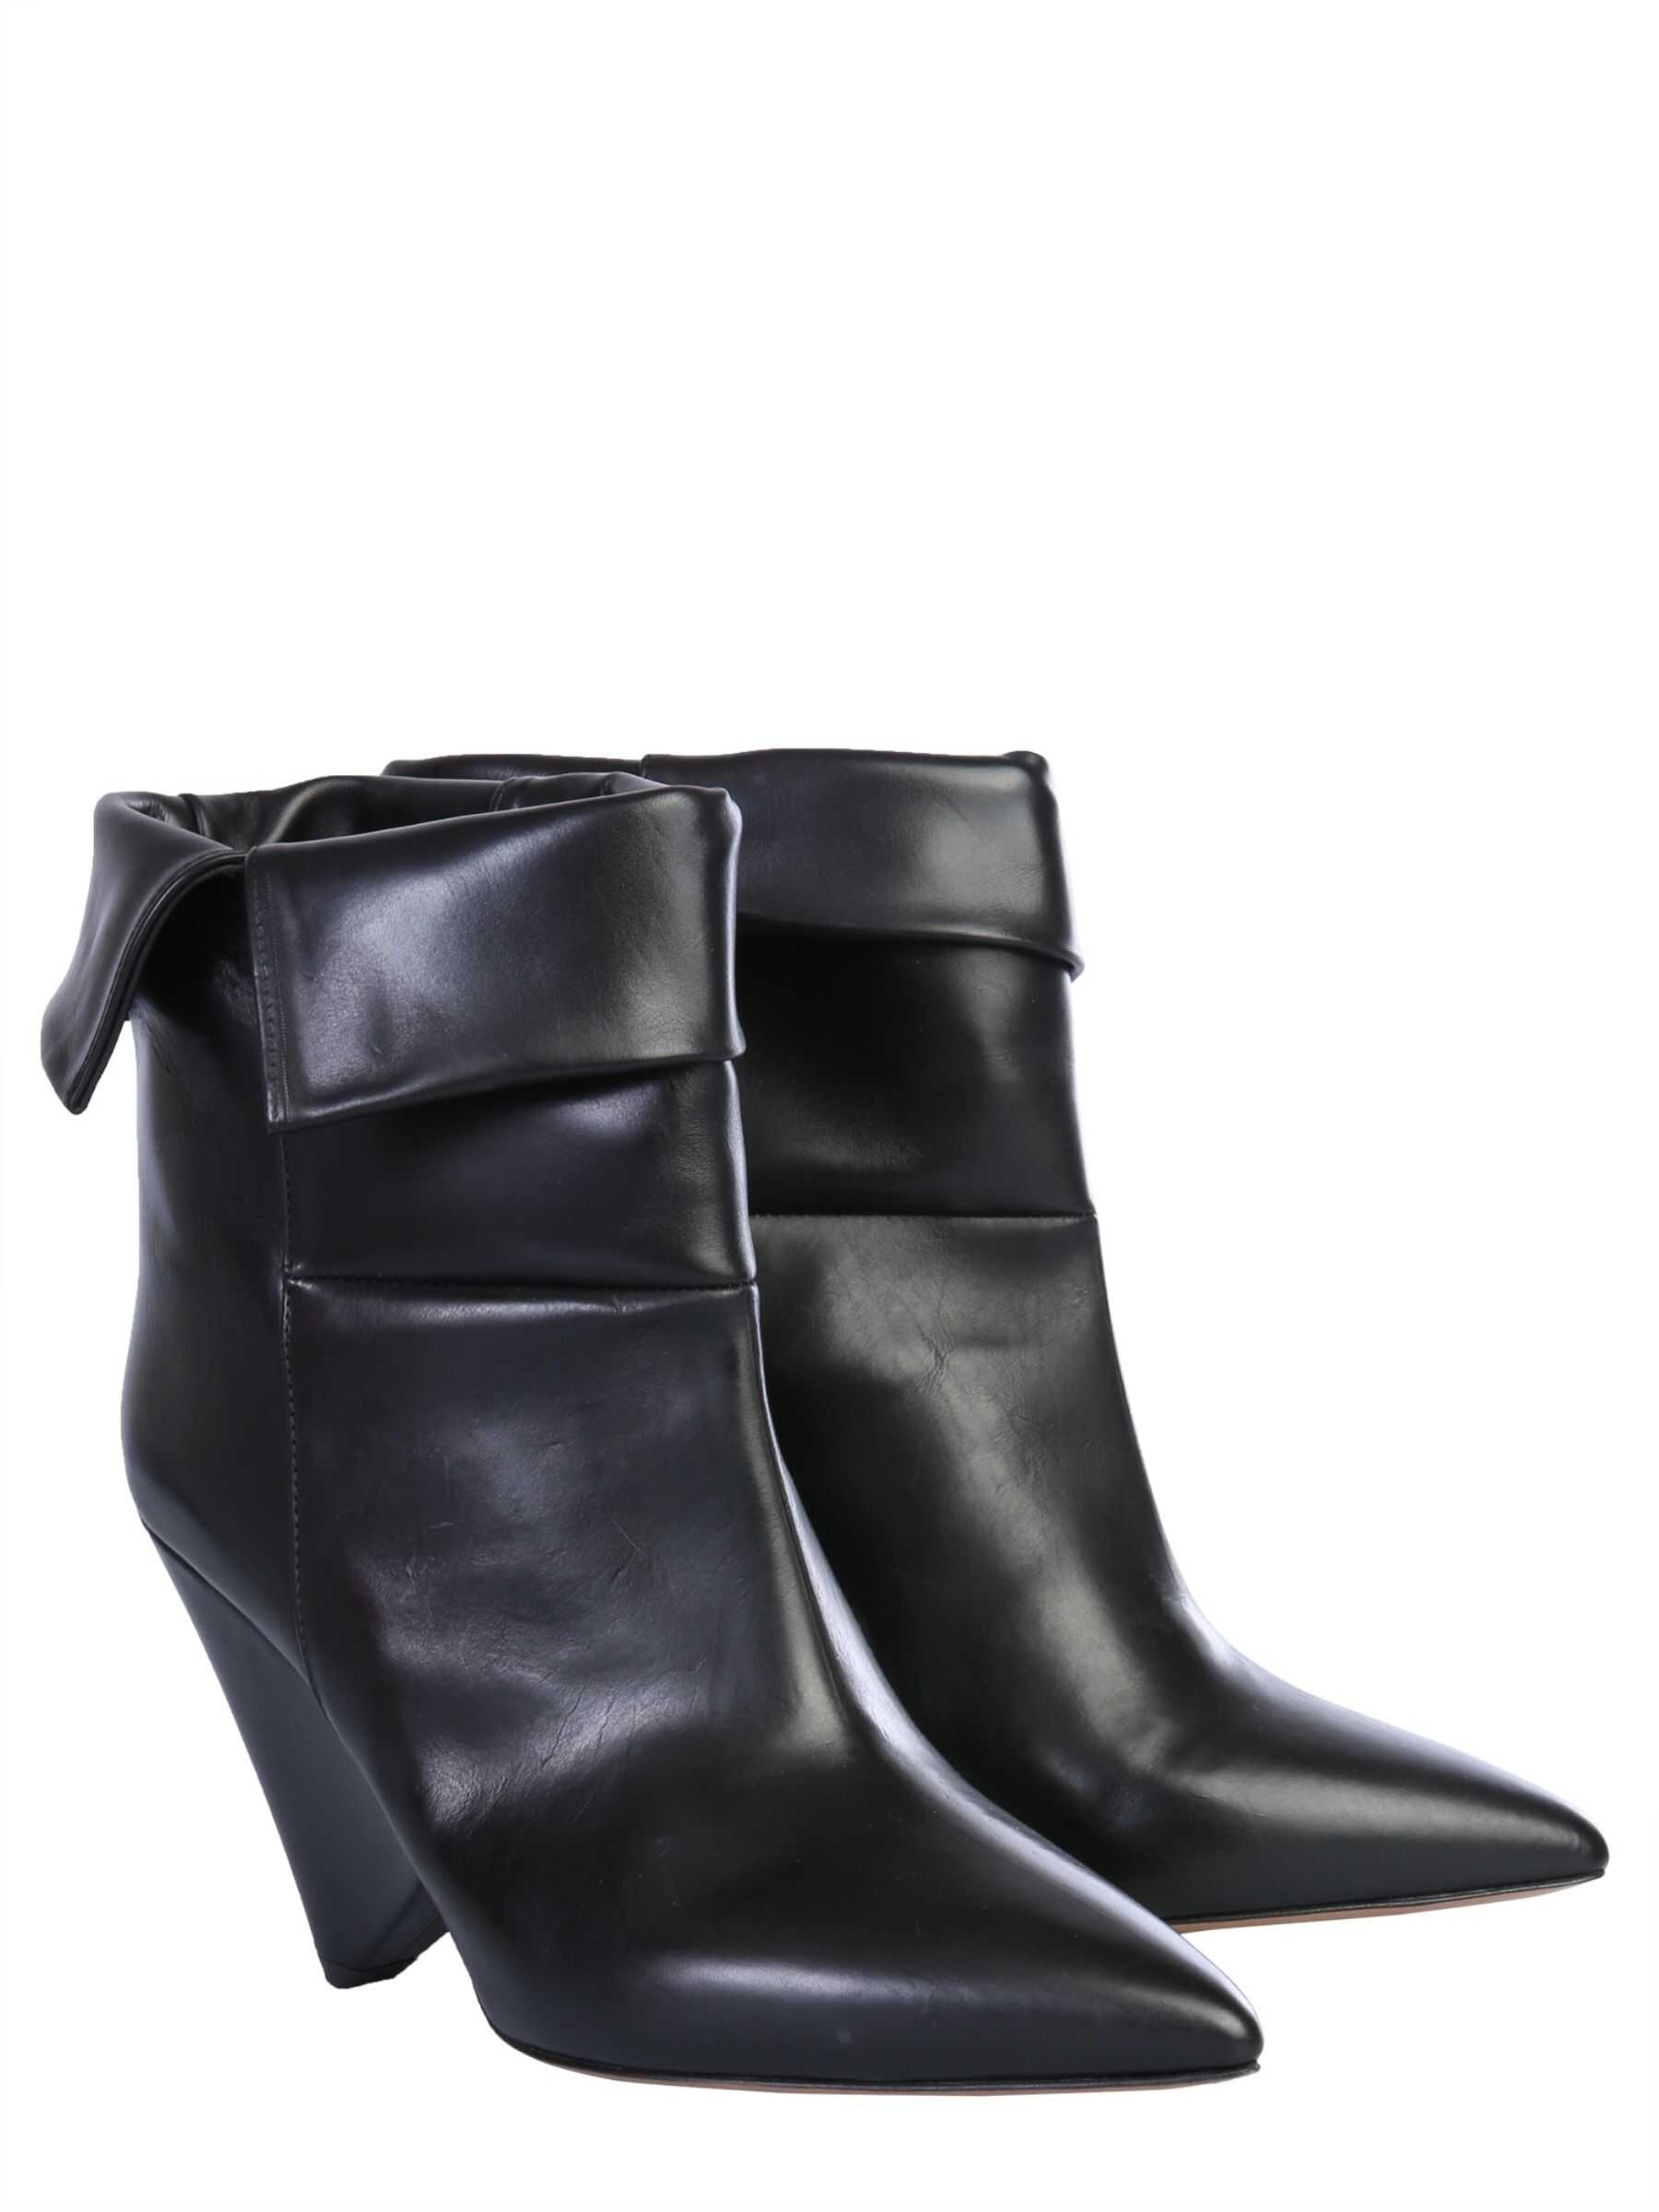 Isabel Marant Luliana Boots BLACK